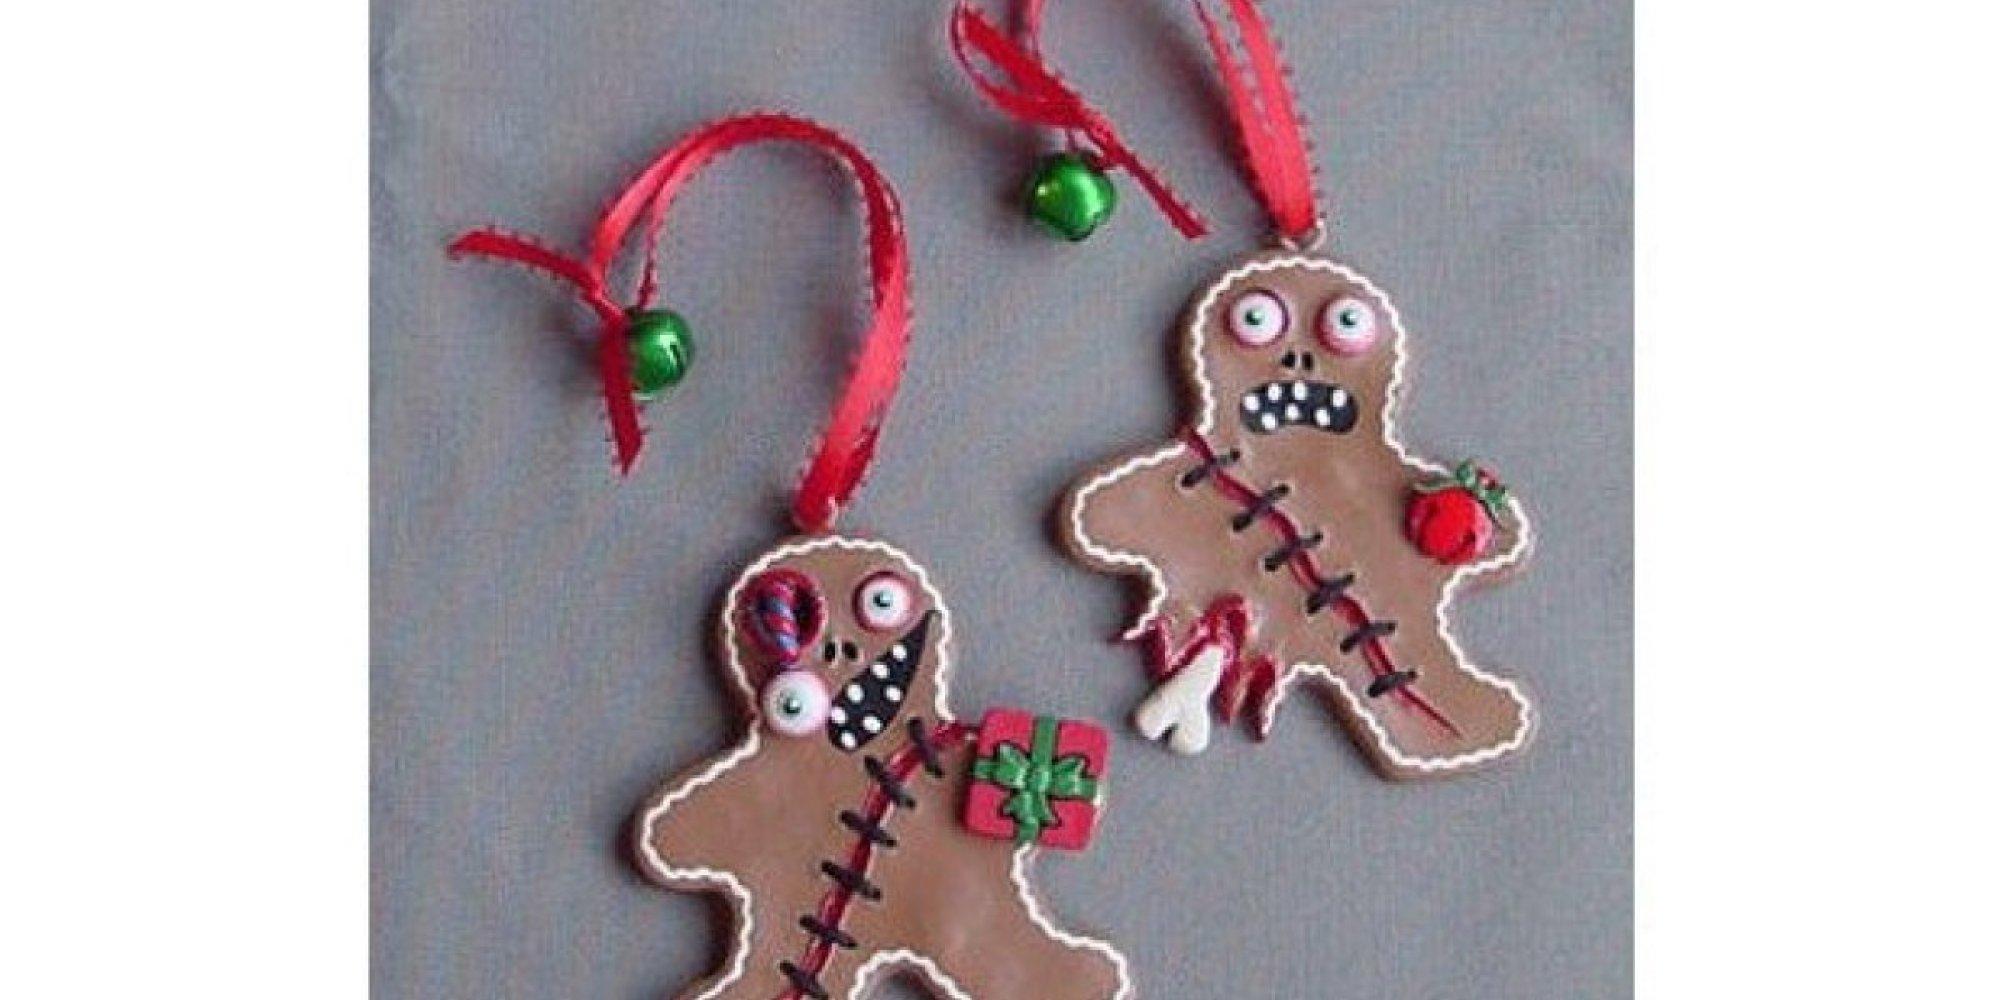 Lawyer christmas ornaments - Lawyer Christmas Ornaments 26